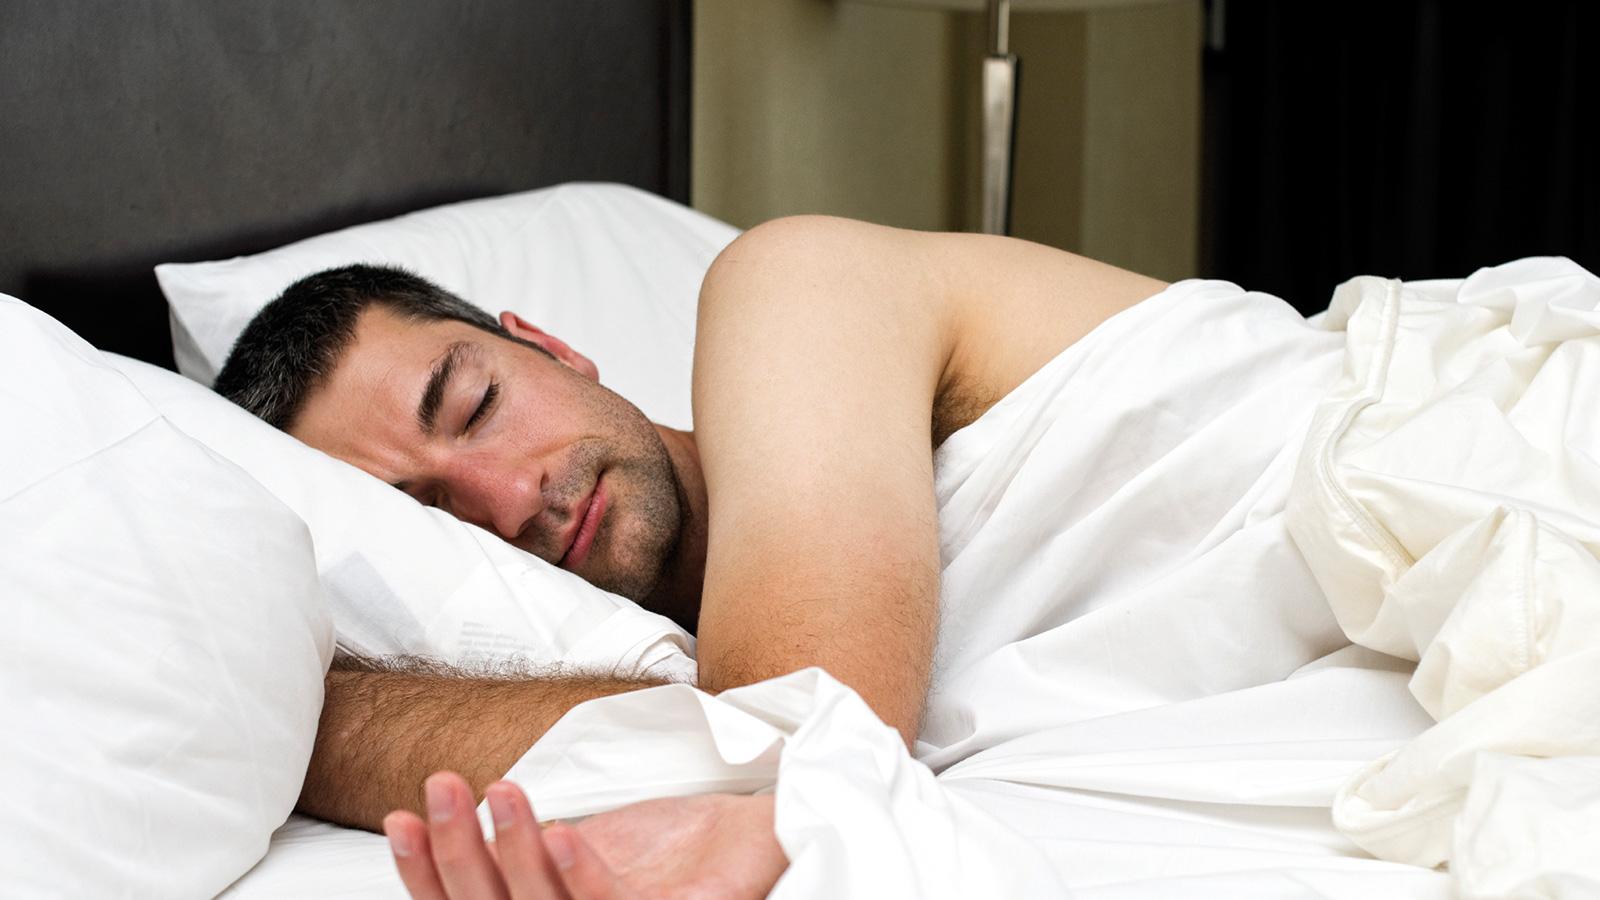 Sommeil-Homme-Dormir-Lit